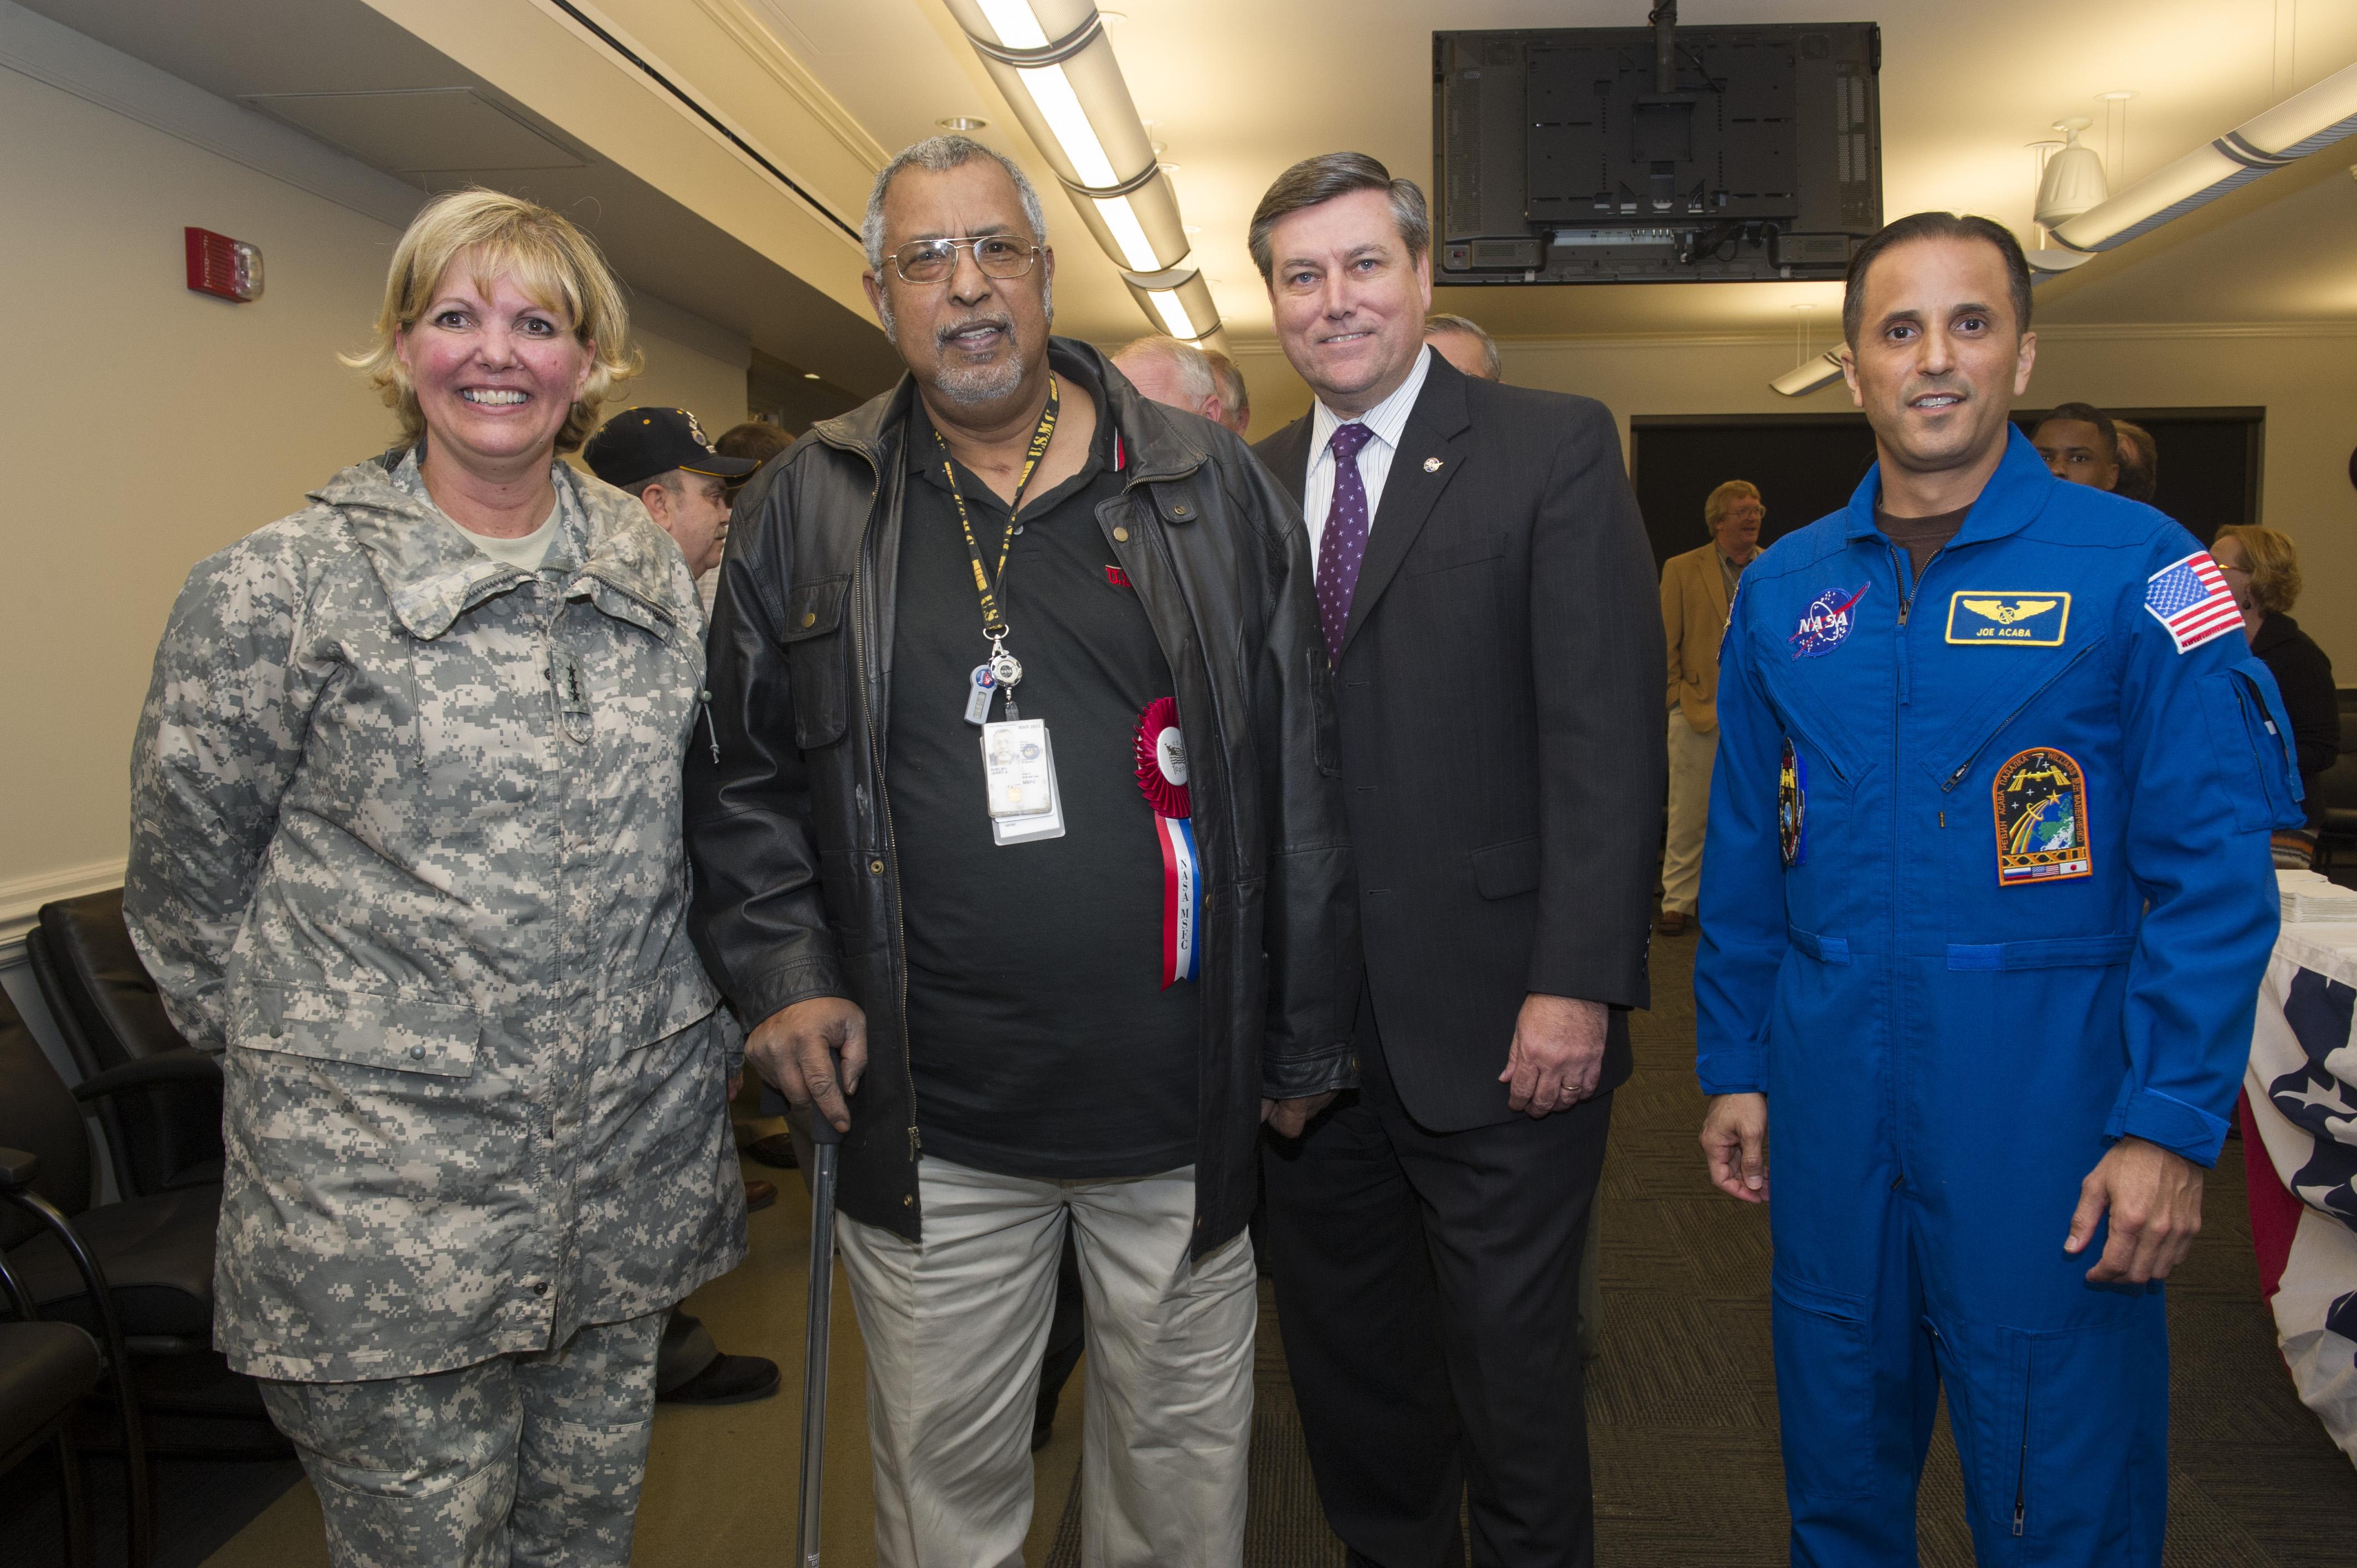 NASA - Marshall Star, November 14, 2012 Edition